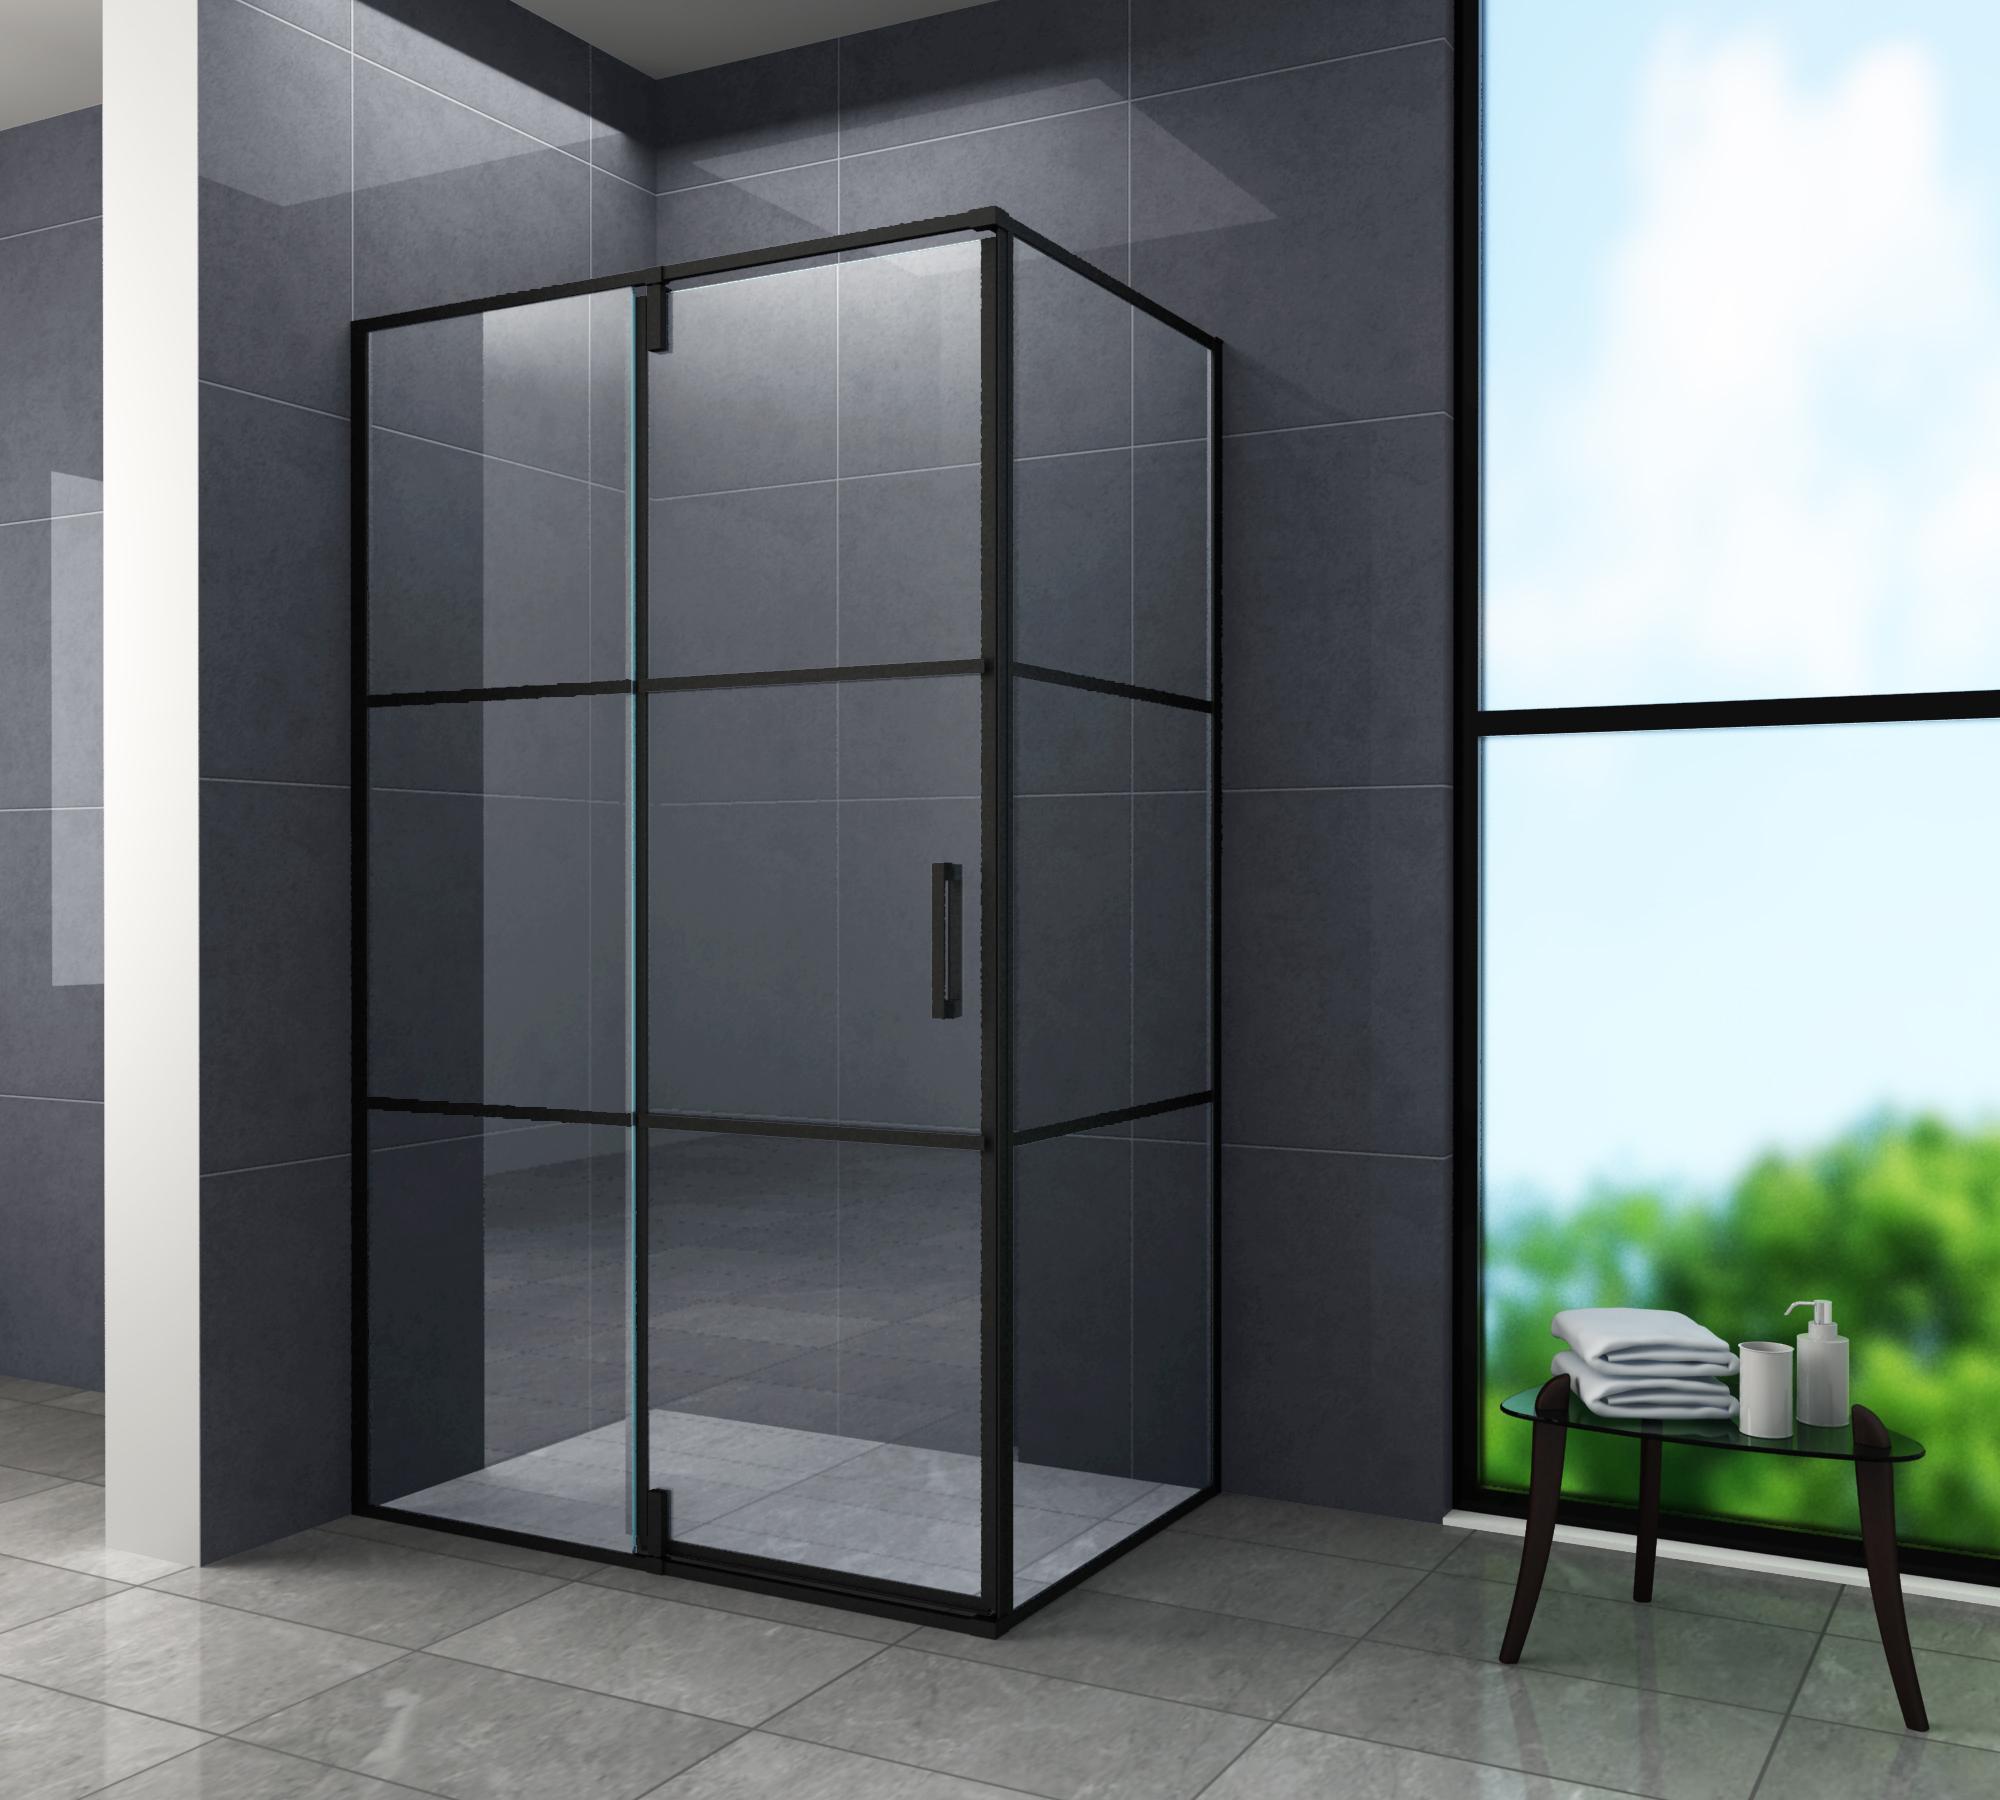 Duschkabine FABRICO 120 x 90 x 195 cm ohne Duschtasse